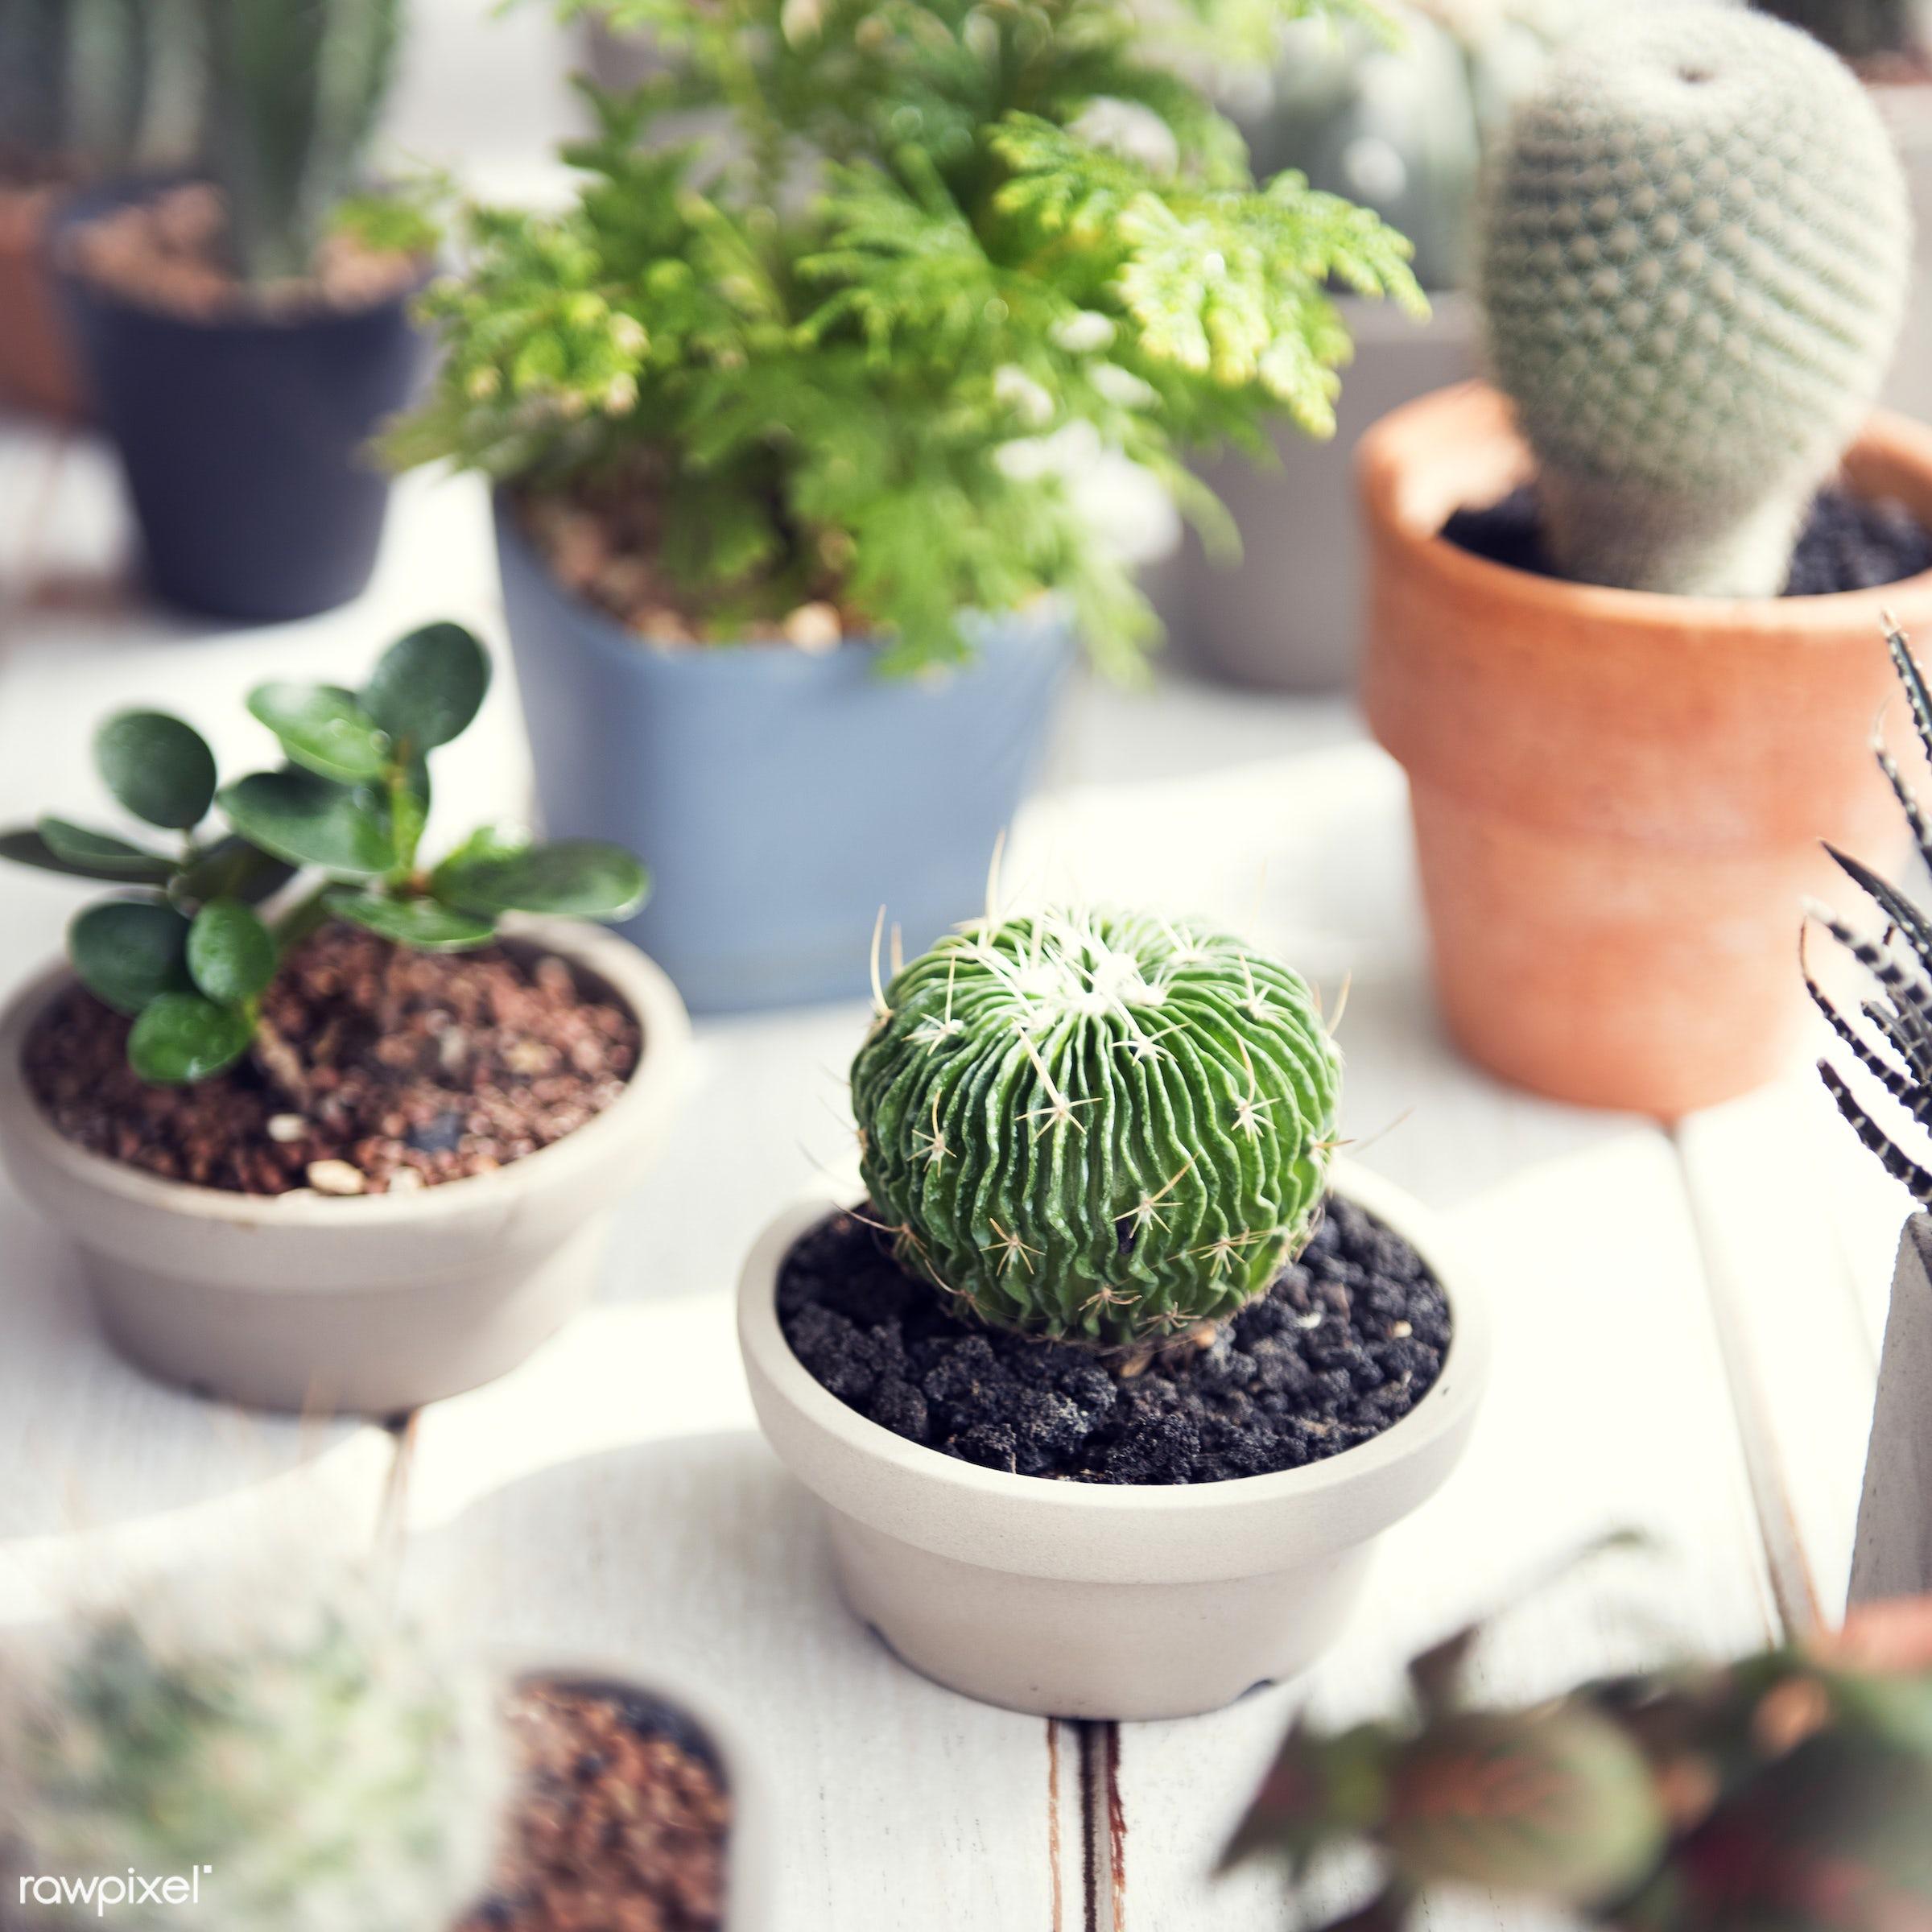 nobody, botany, green, plants, real, houseplants, pots, wooden table, closeup, cactus